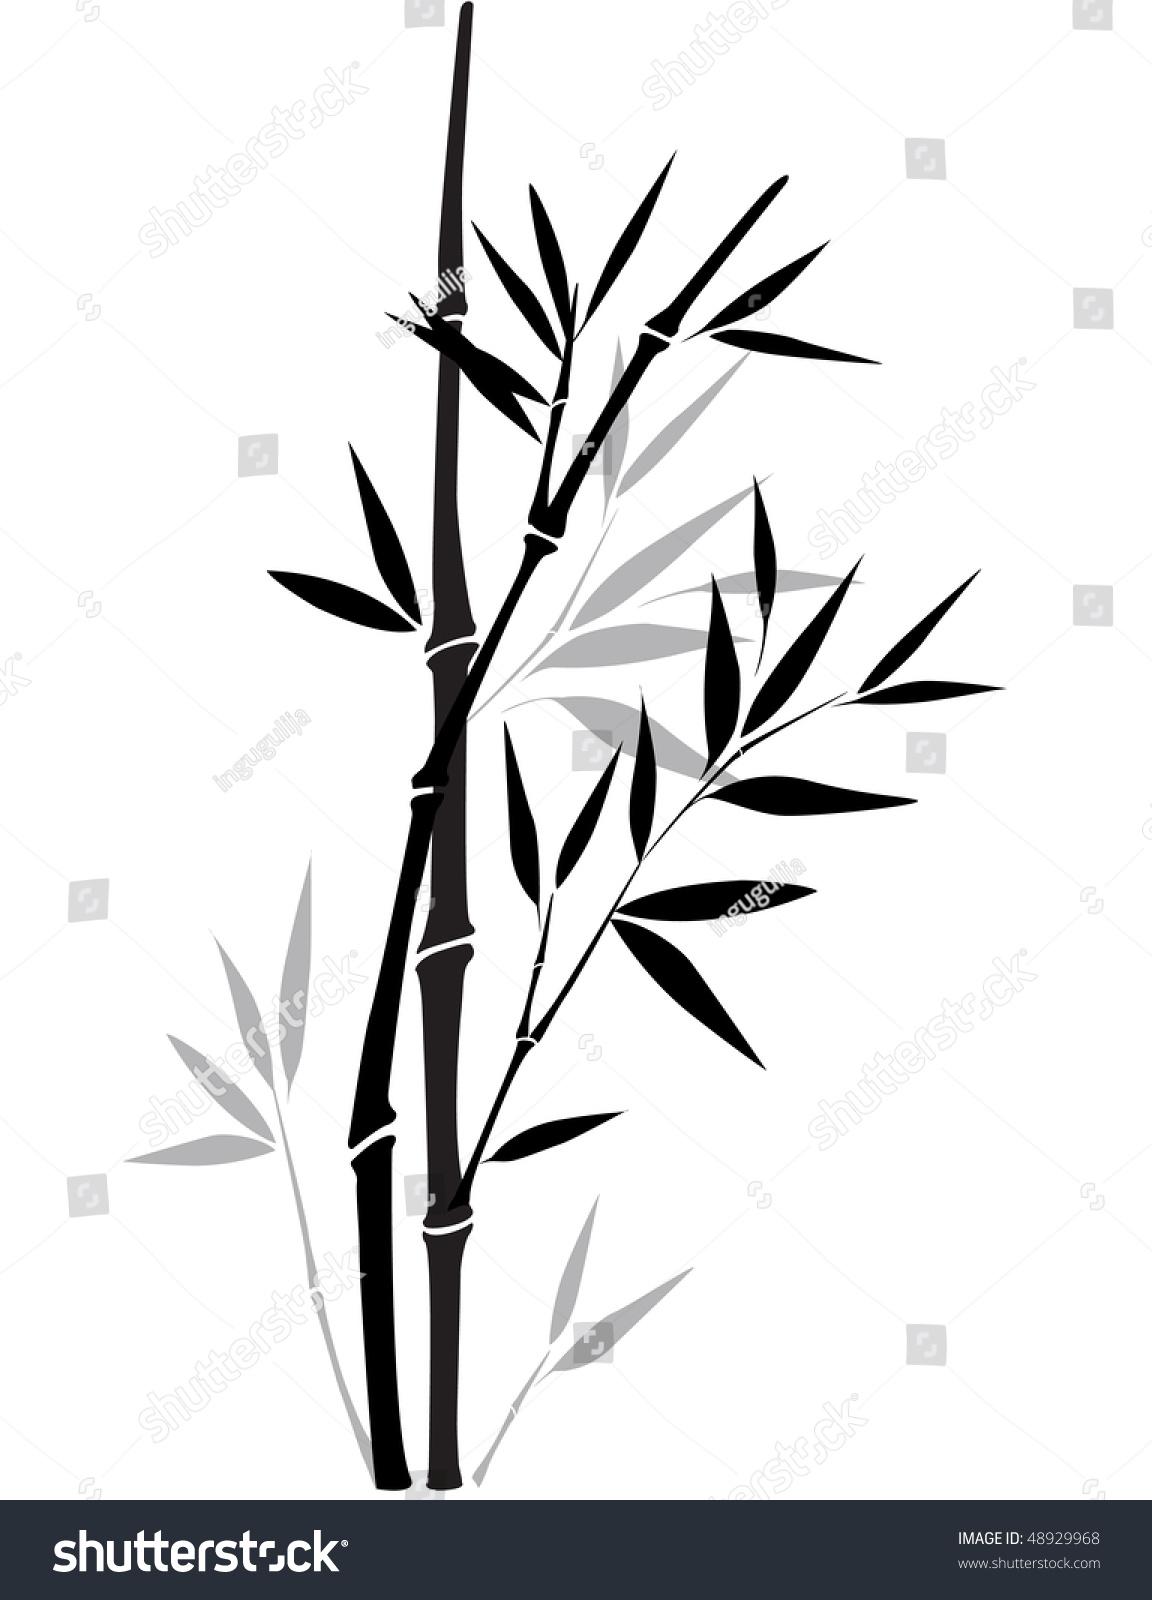 Black white bamboo stock vector 48929968 shutterstock - Black and wait ...